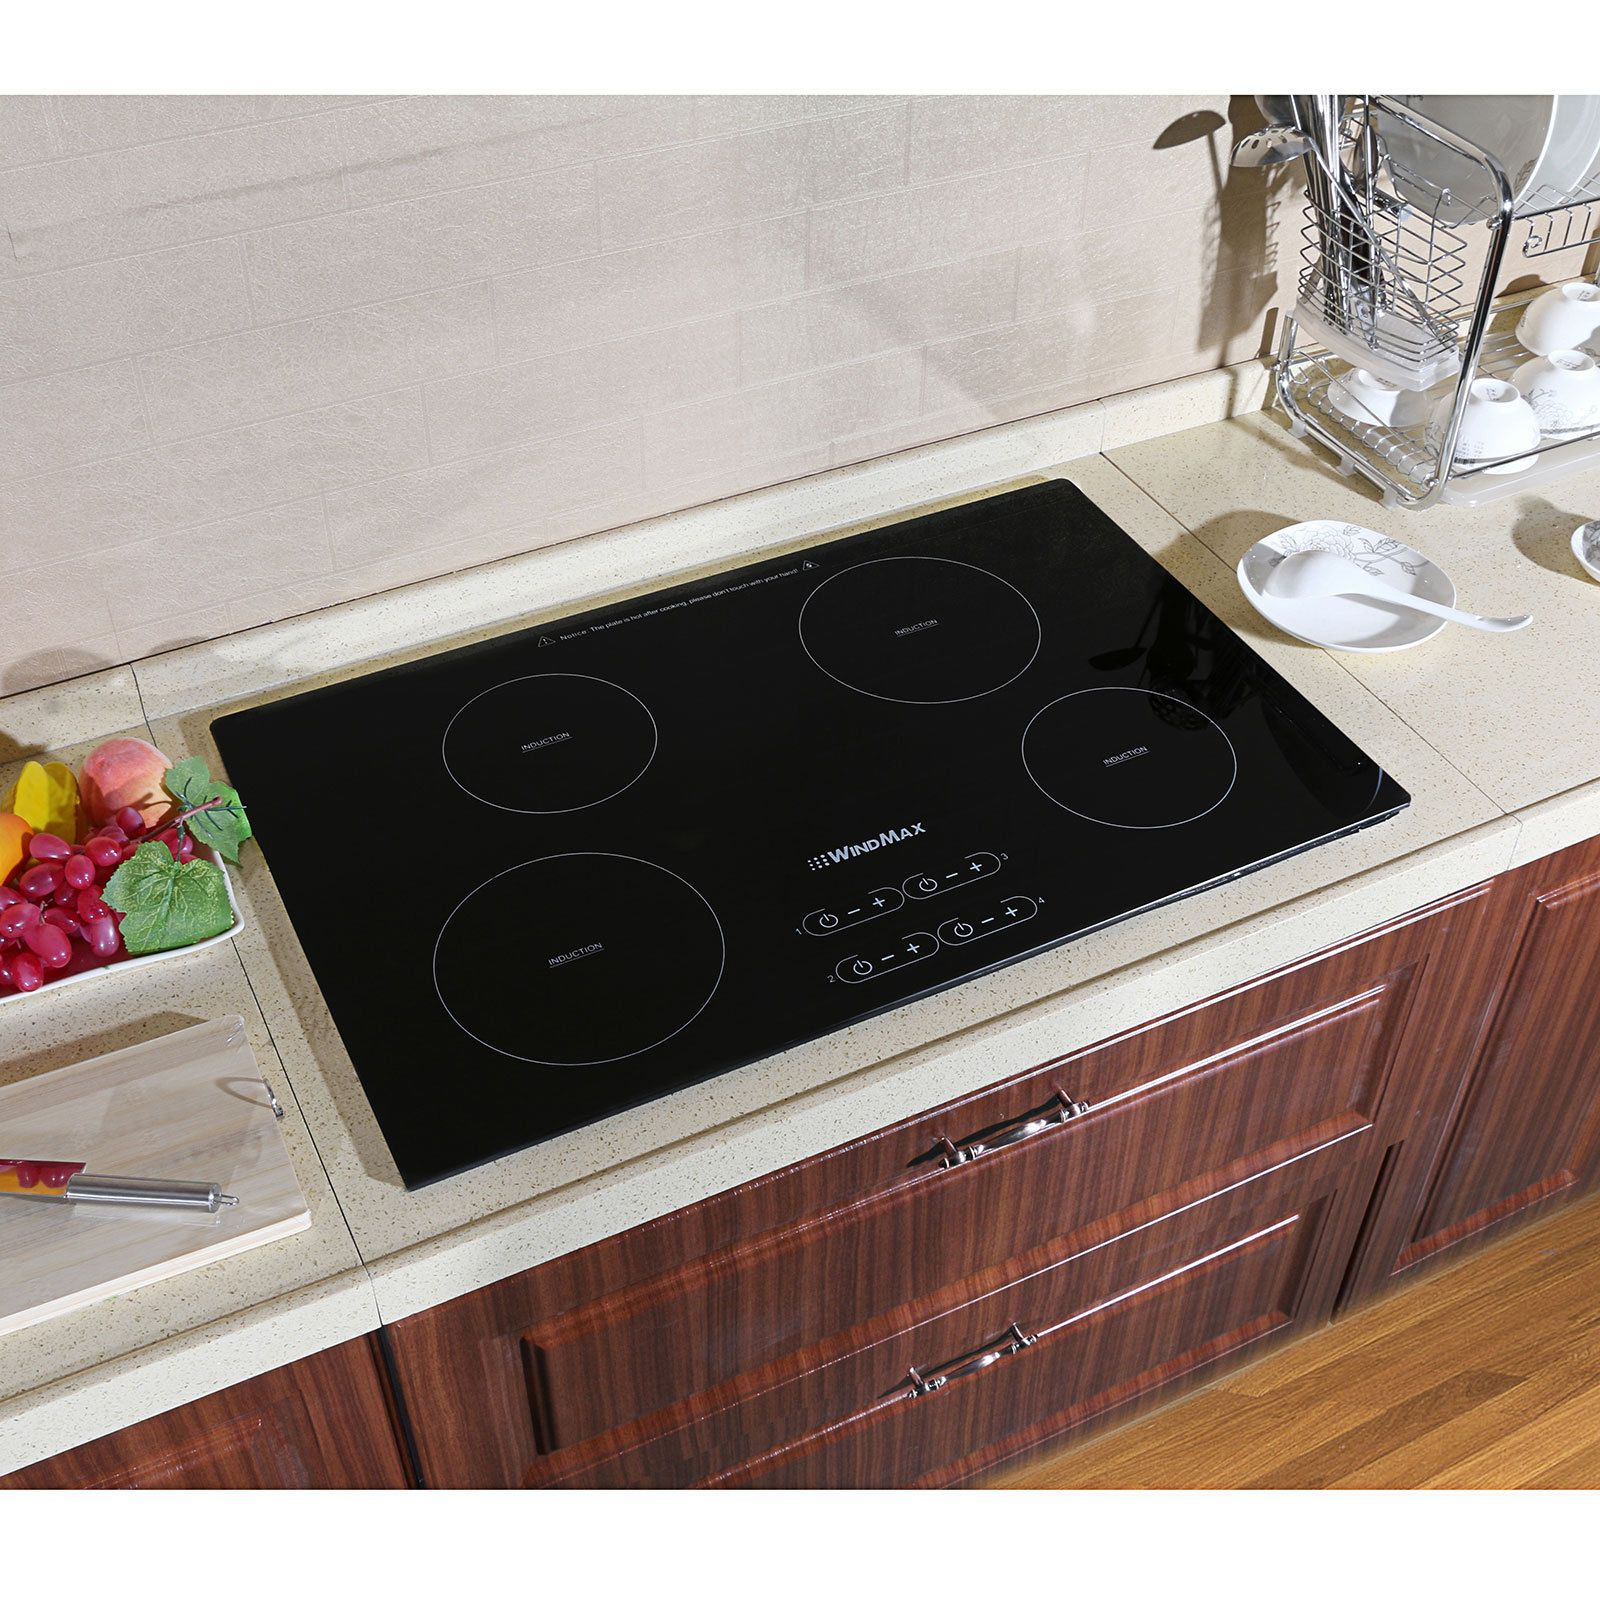 Windmax 31 5 Inch 240v Induction Hob 4 Burner A Grade Glass Plate